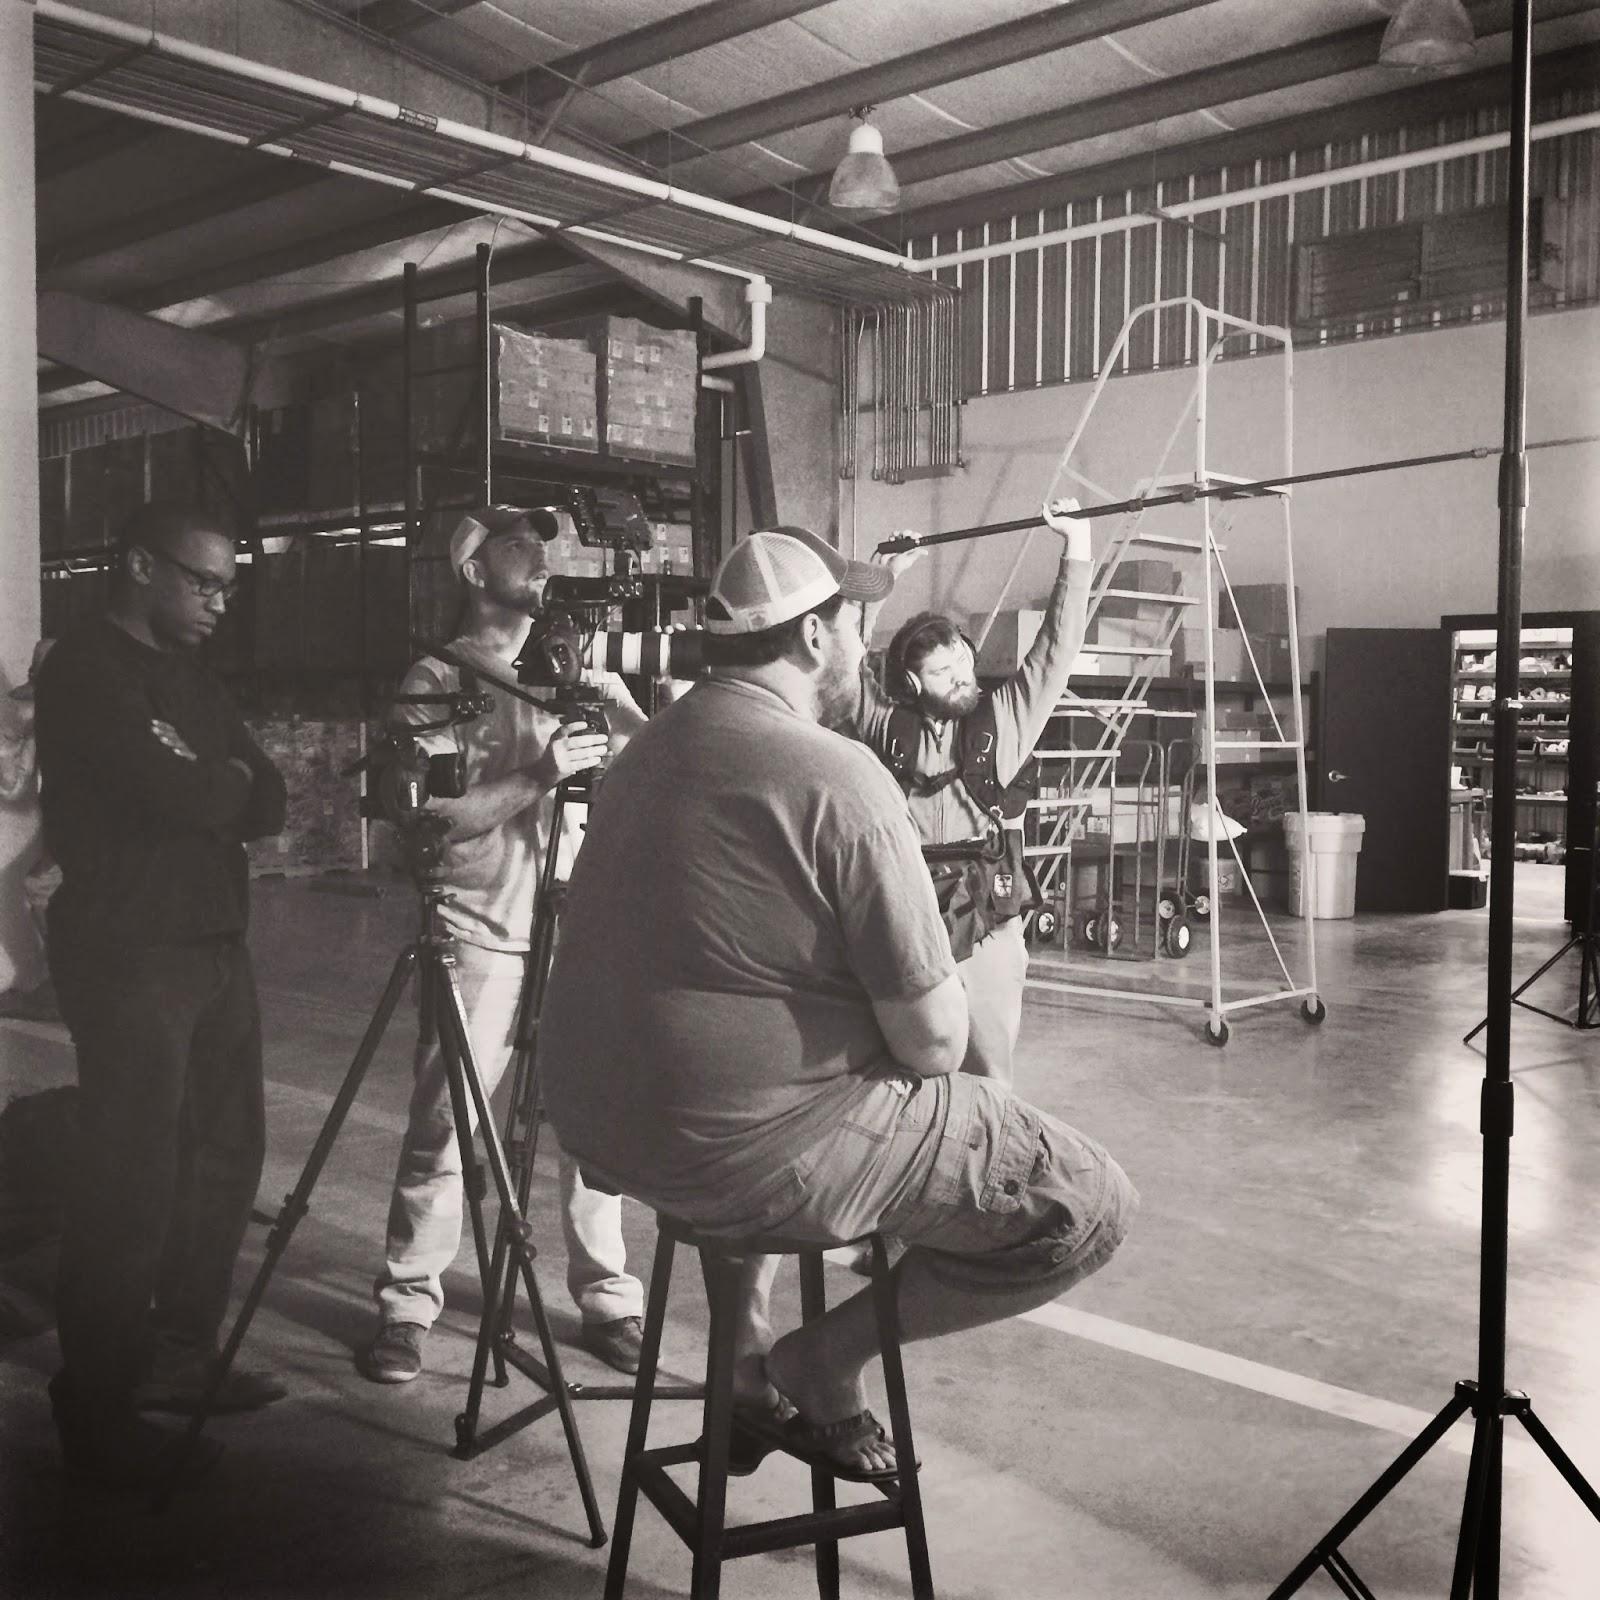 Dan Jones, Fred Mince, Jay Ducote, and Jordan Lewis getting footage at the Bayou Rum distillery